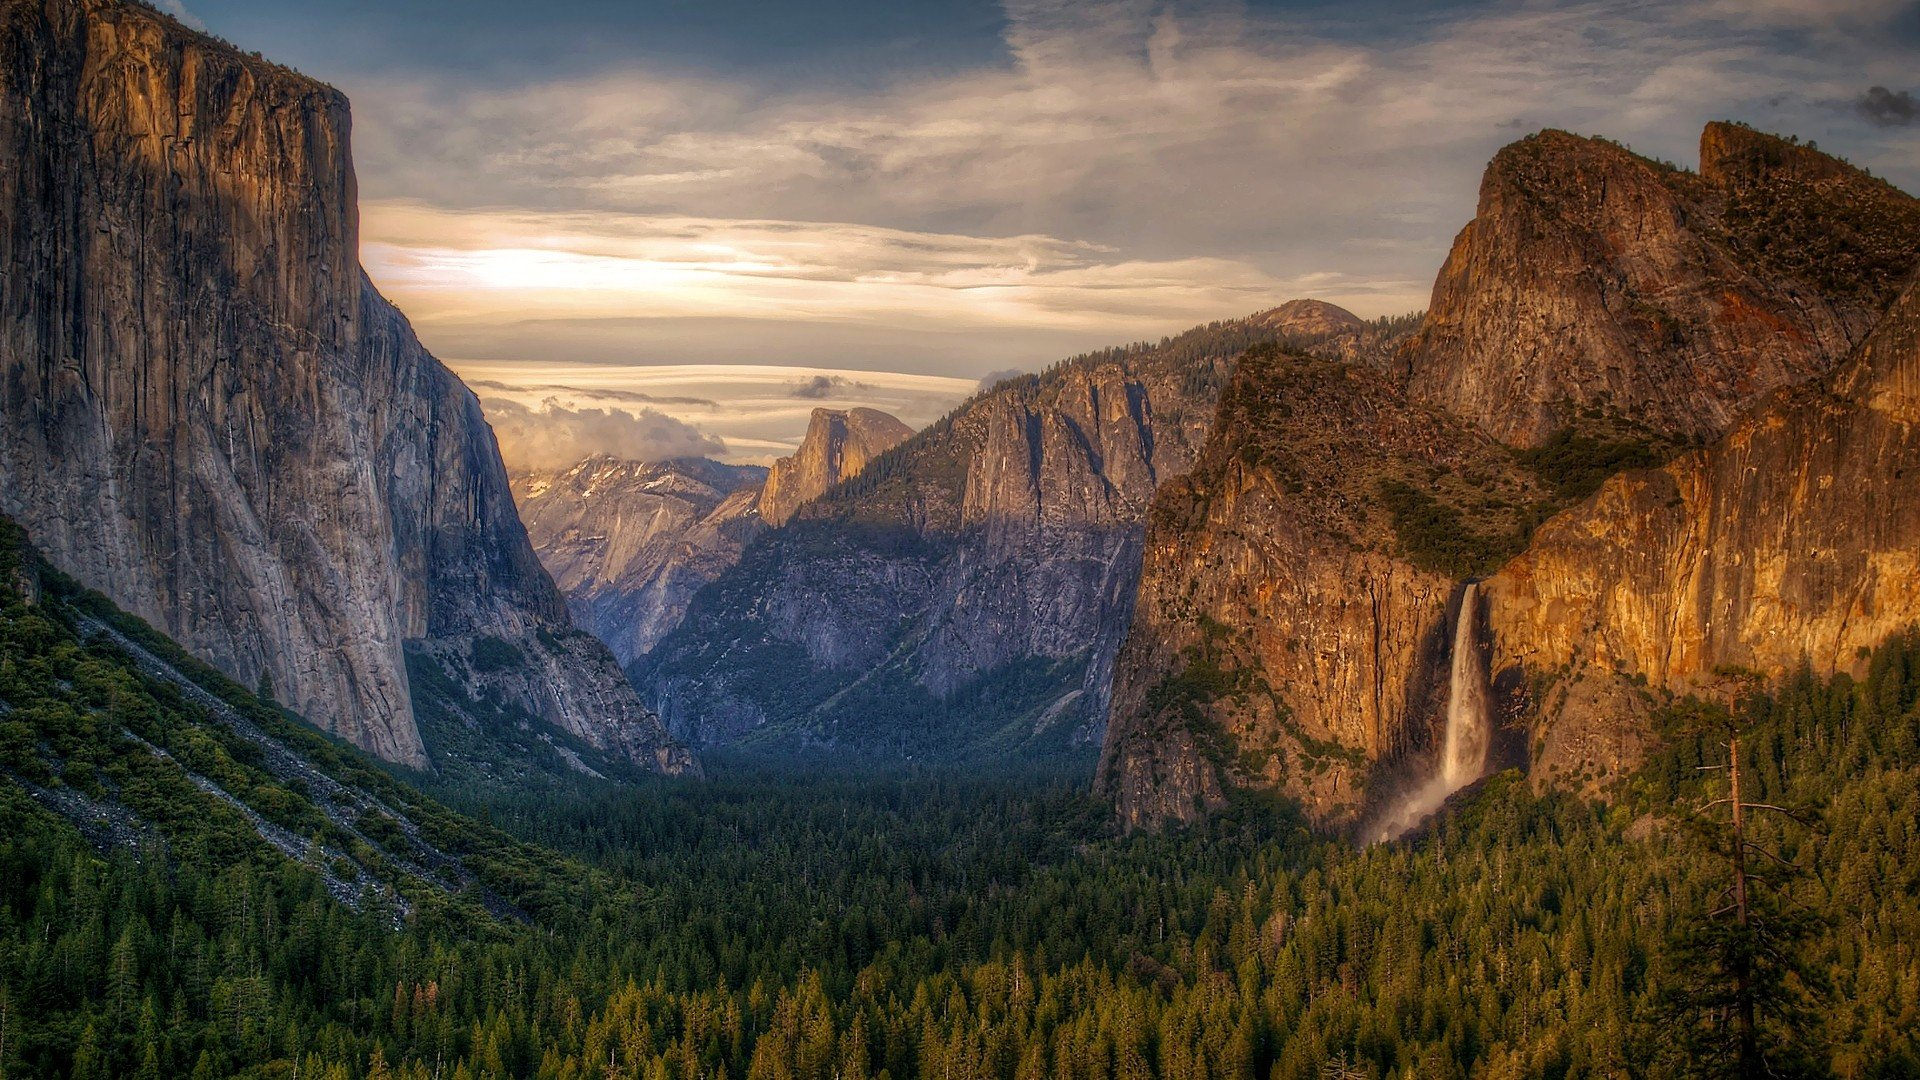 Yosemite Mountain Landscape Wallpaper HD 18 High Resolution Wallpaper 1920x1080